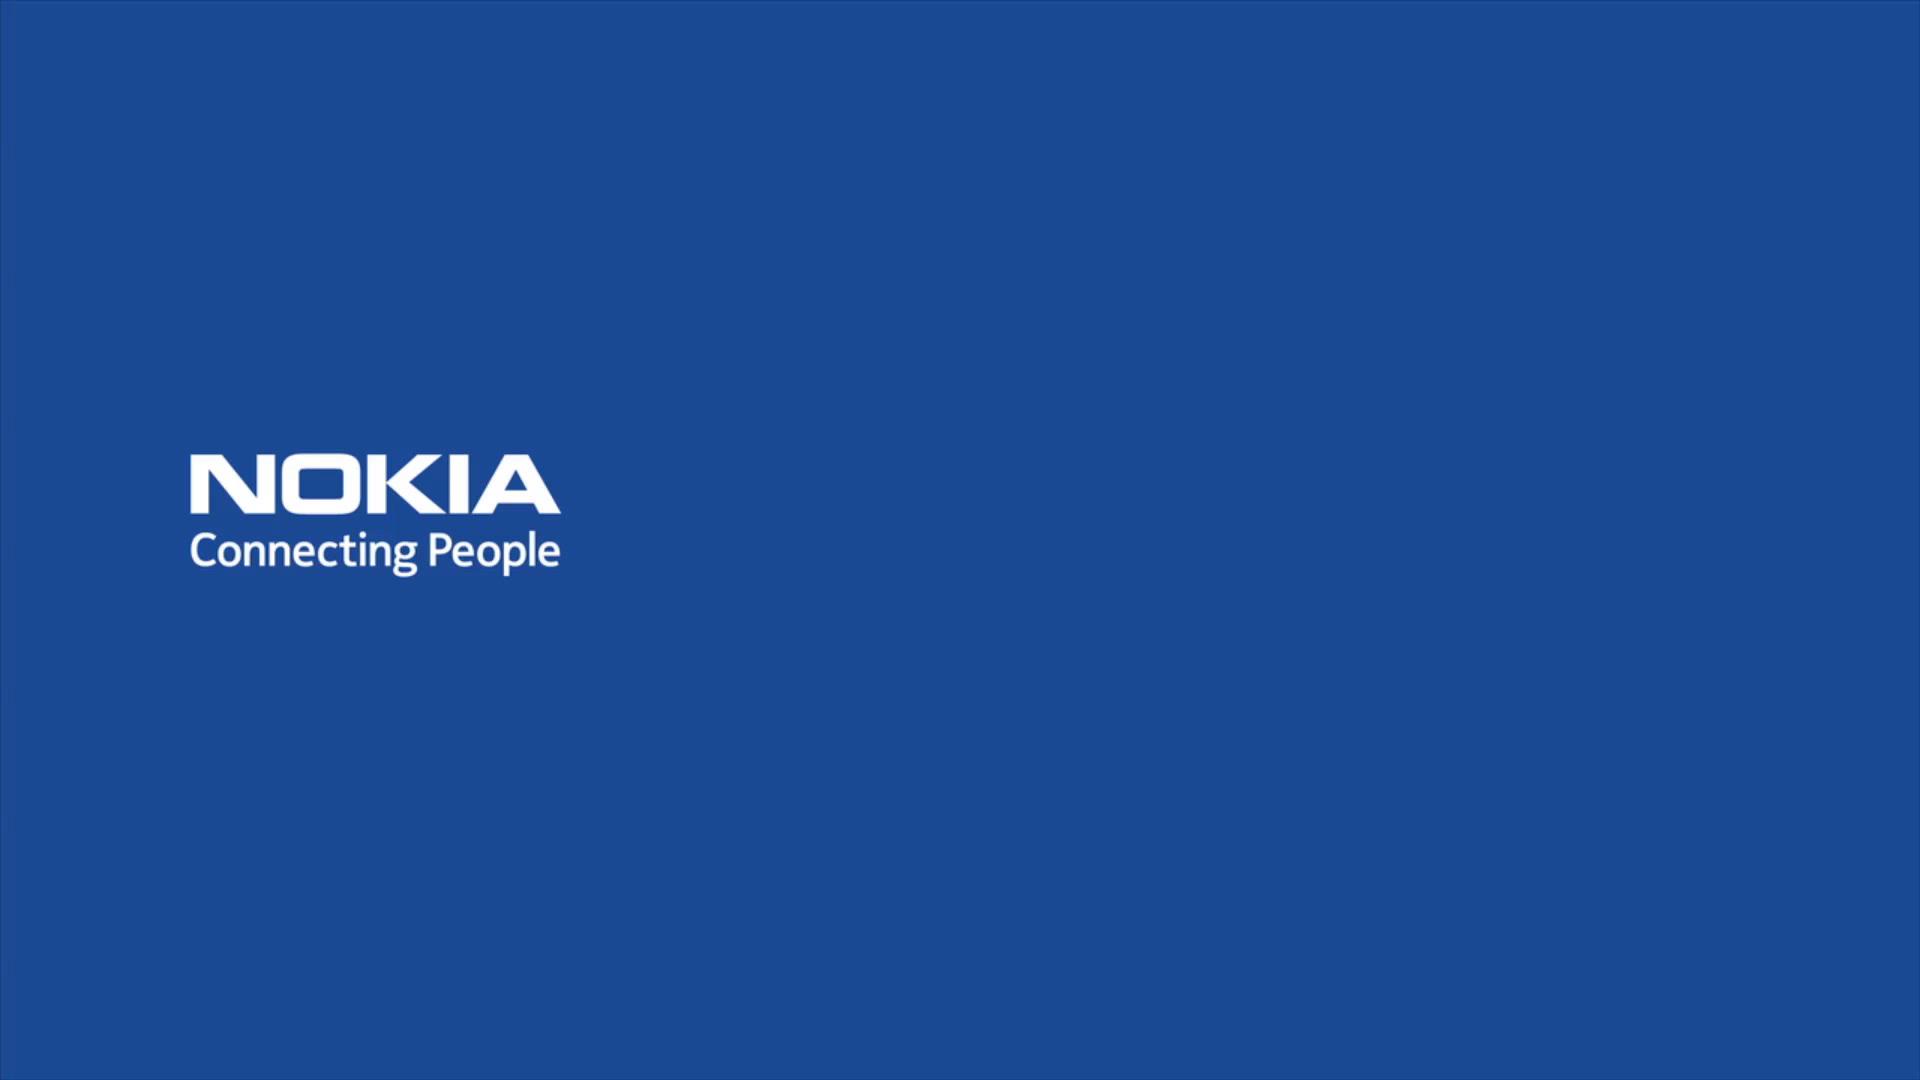 1471889946_nokia-logo-hd-wallpapers